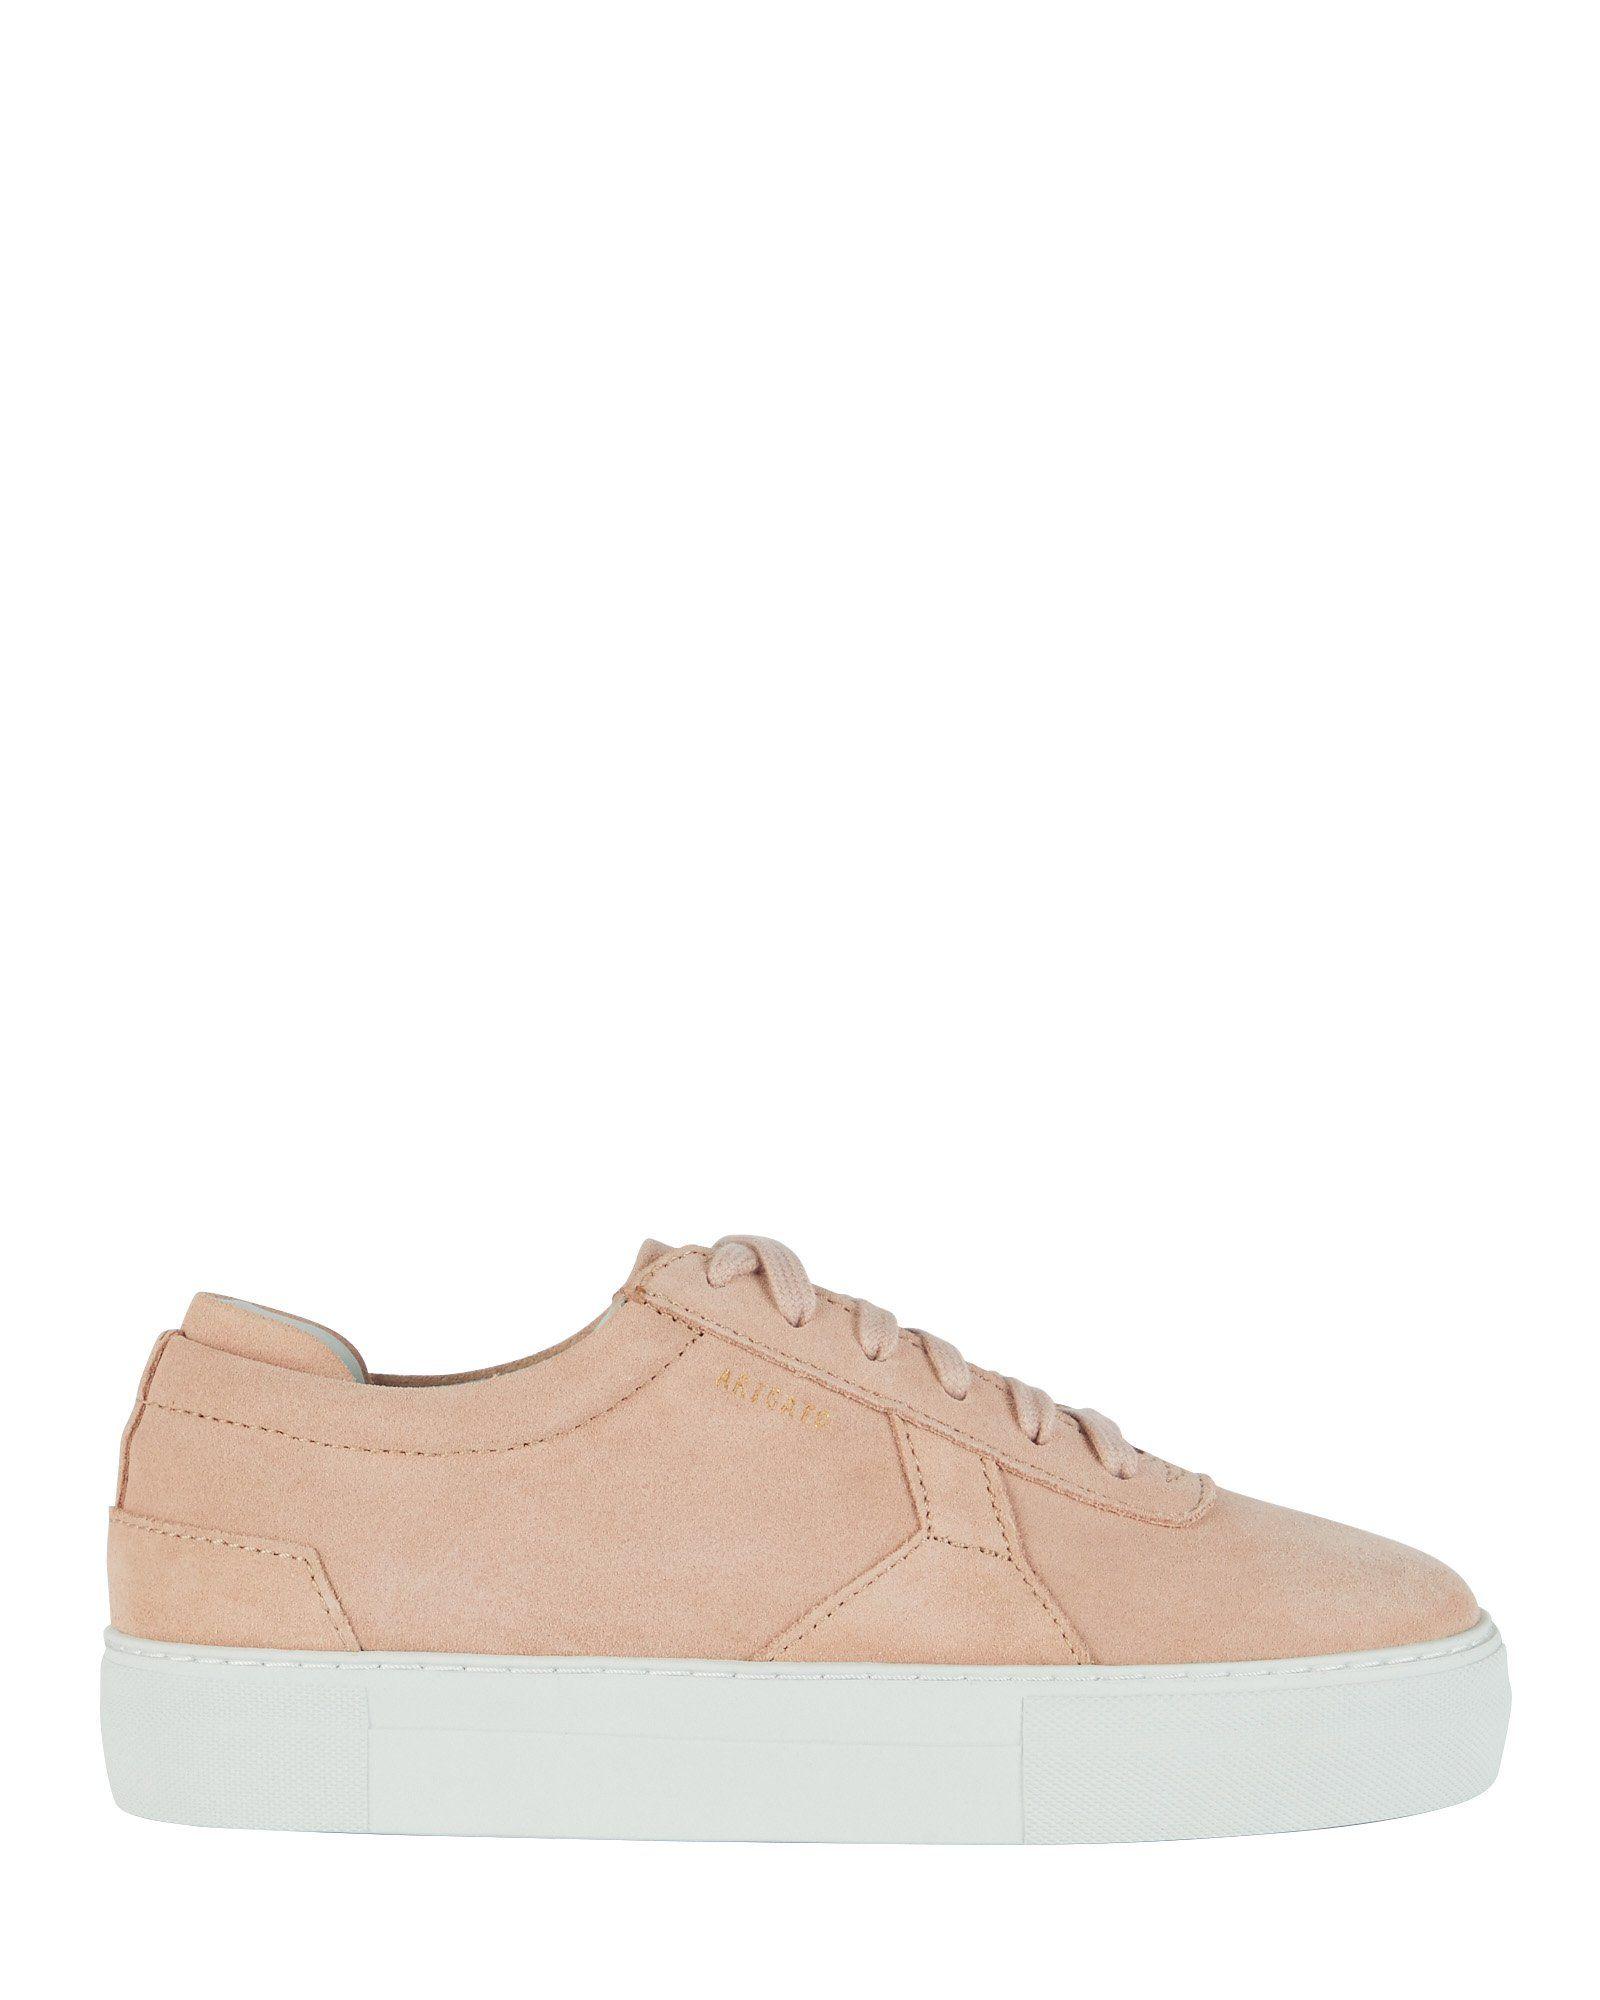 Axel arigato platform lowtop suede sneakers in pink